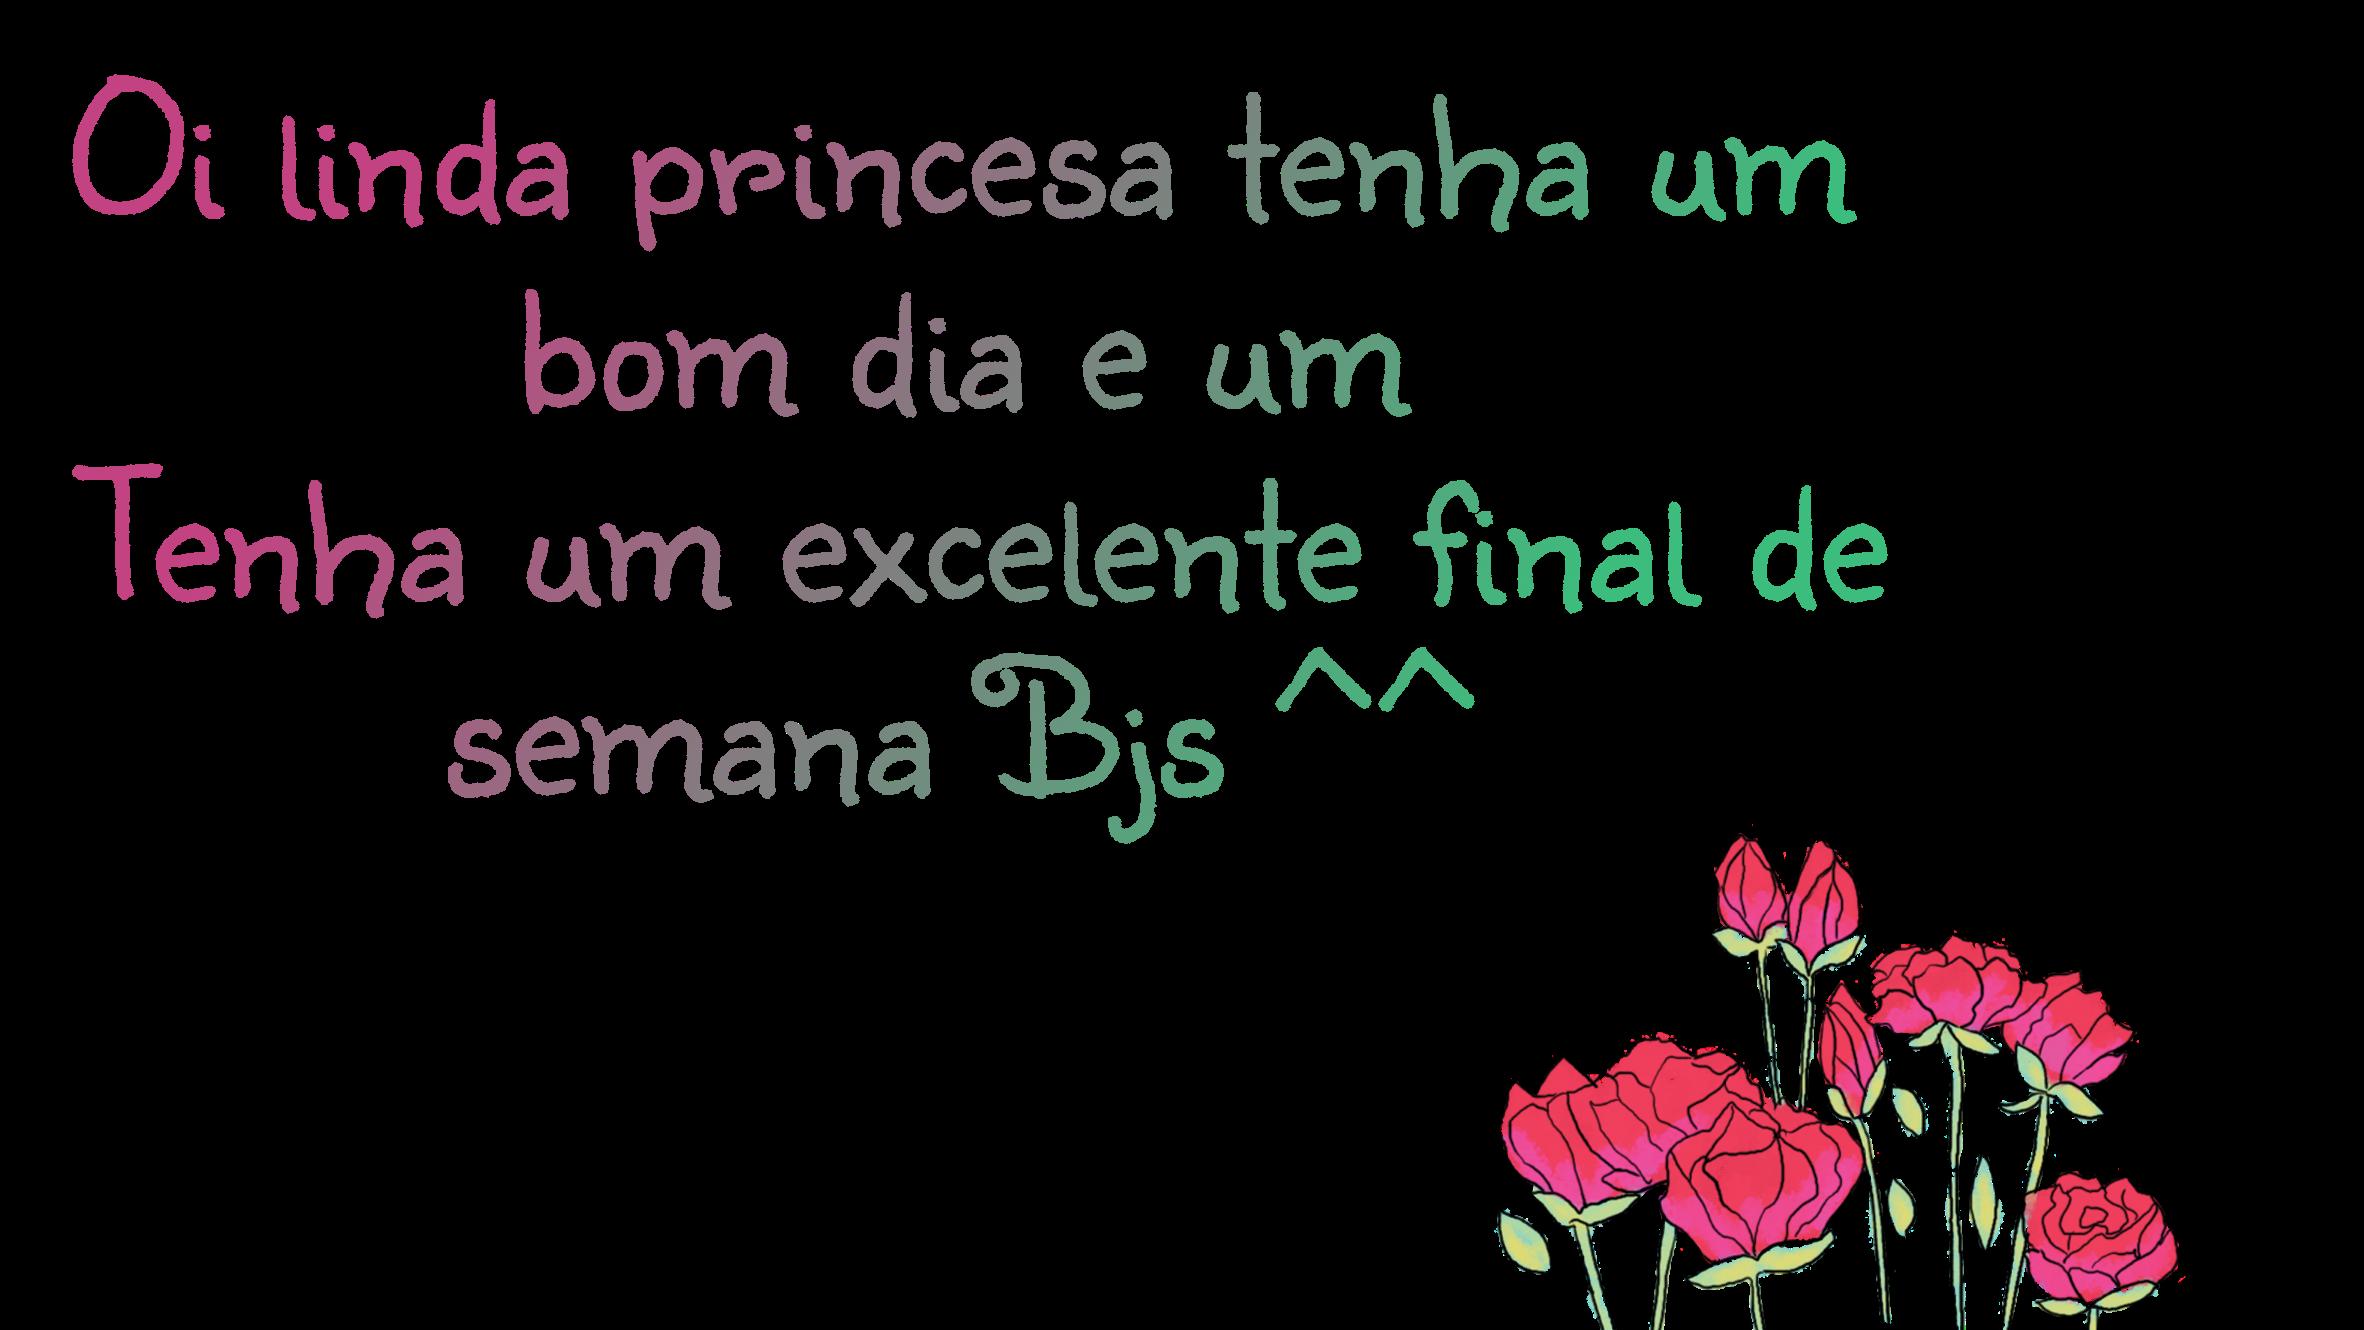 http://photo.princesapop.com/br/1/171/moy/136472.jpg